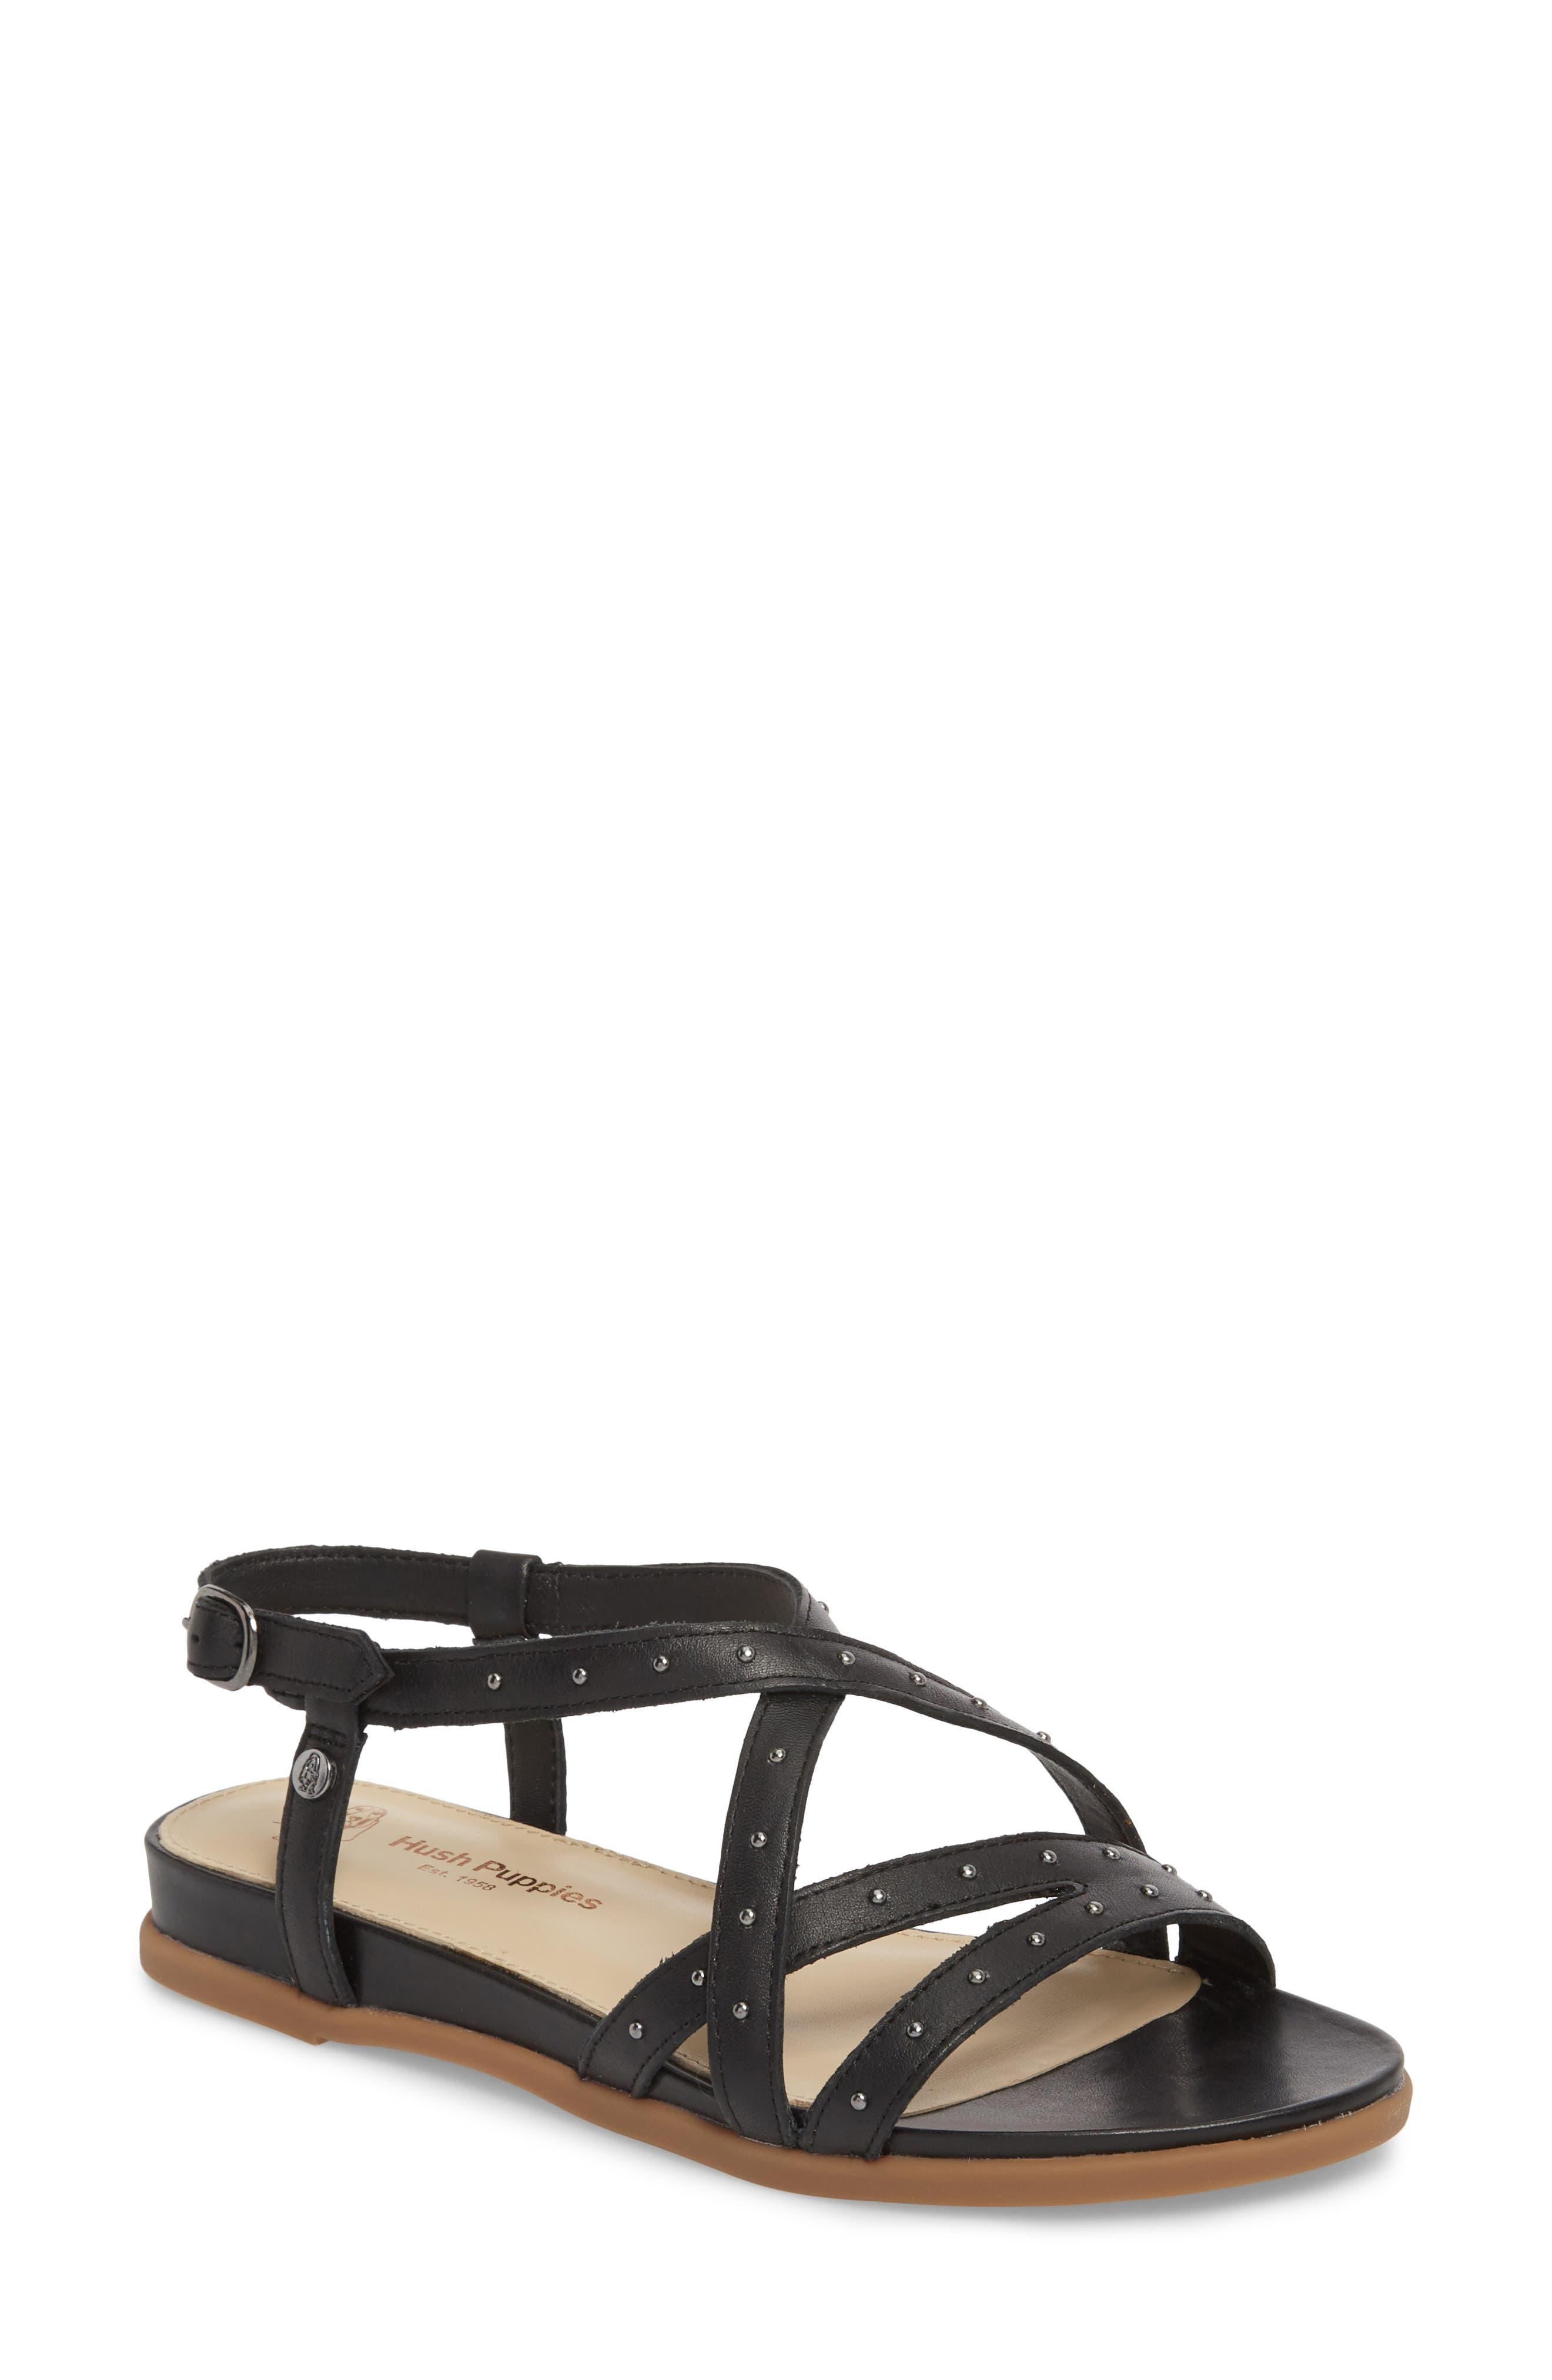 Dalmatian Studded Sandal,                             Main thumbnail 1, color,